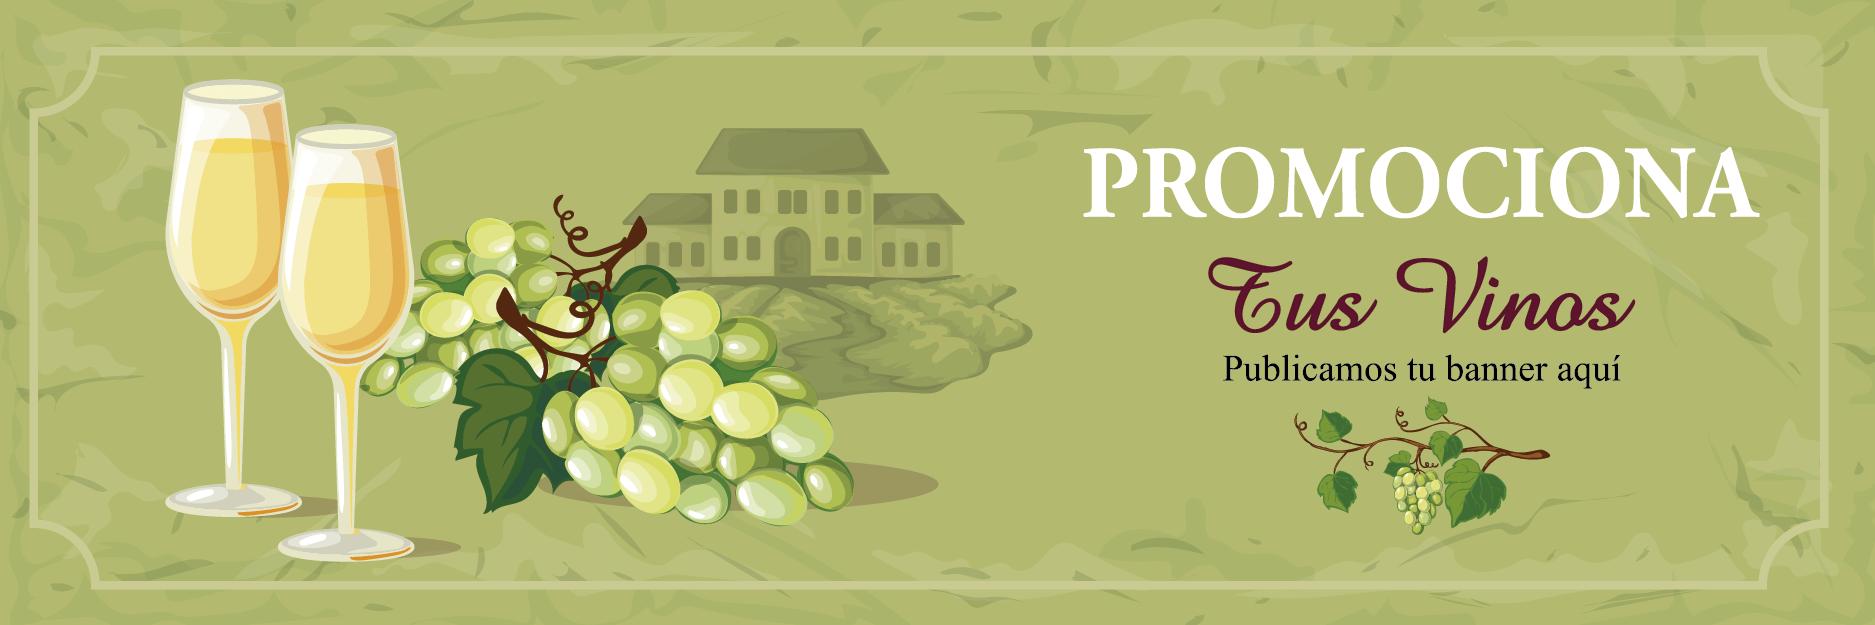 Promociona tus vinos